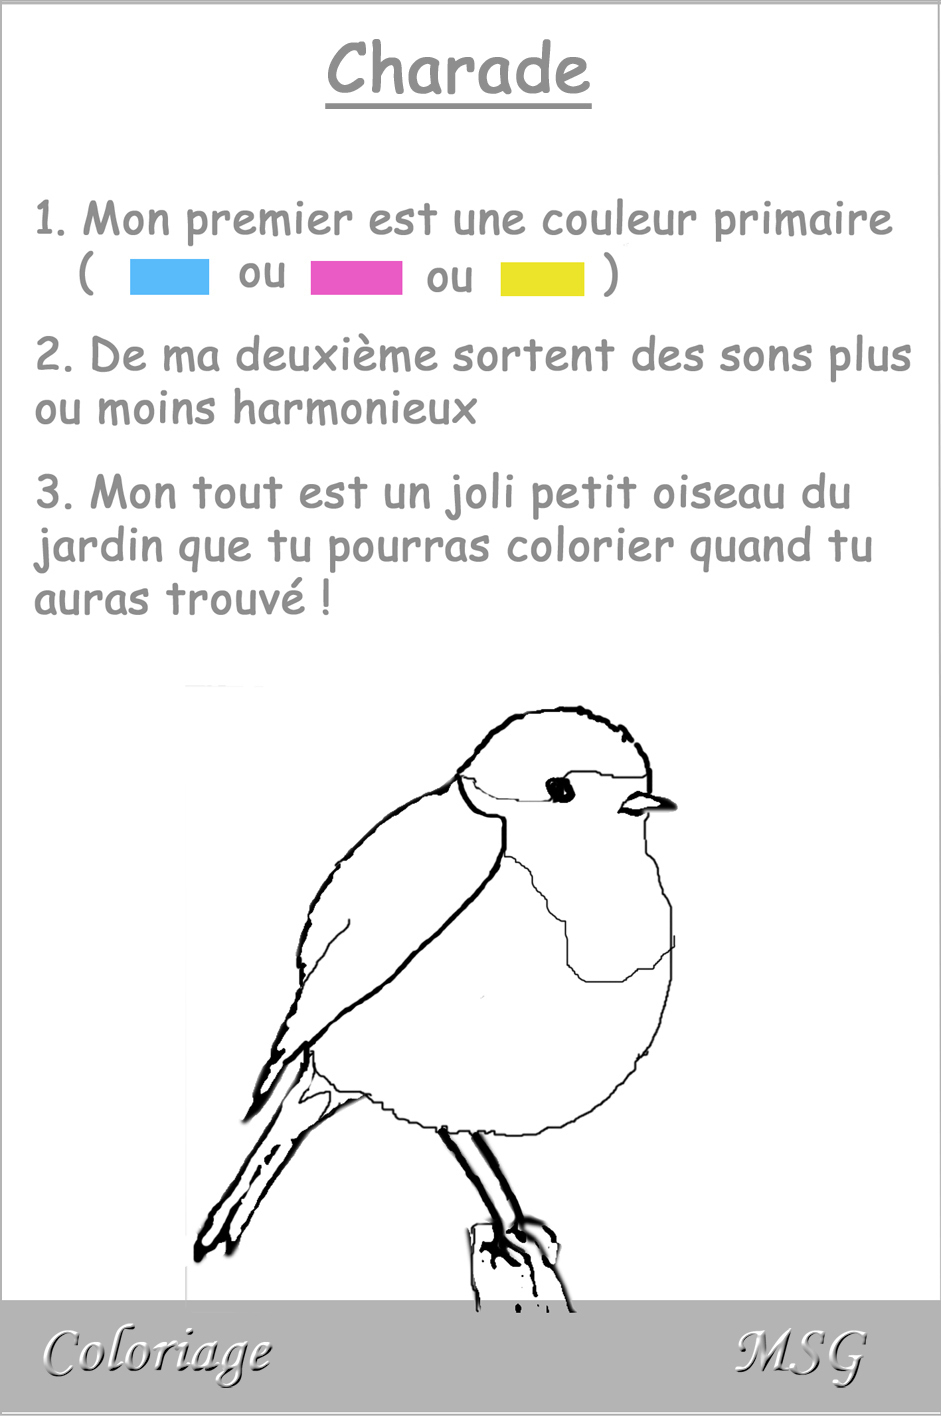 Charade Oiseau 1 - Margareth pour Charade A Imprimer